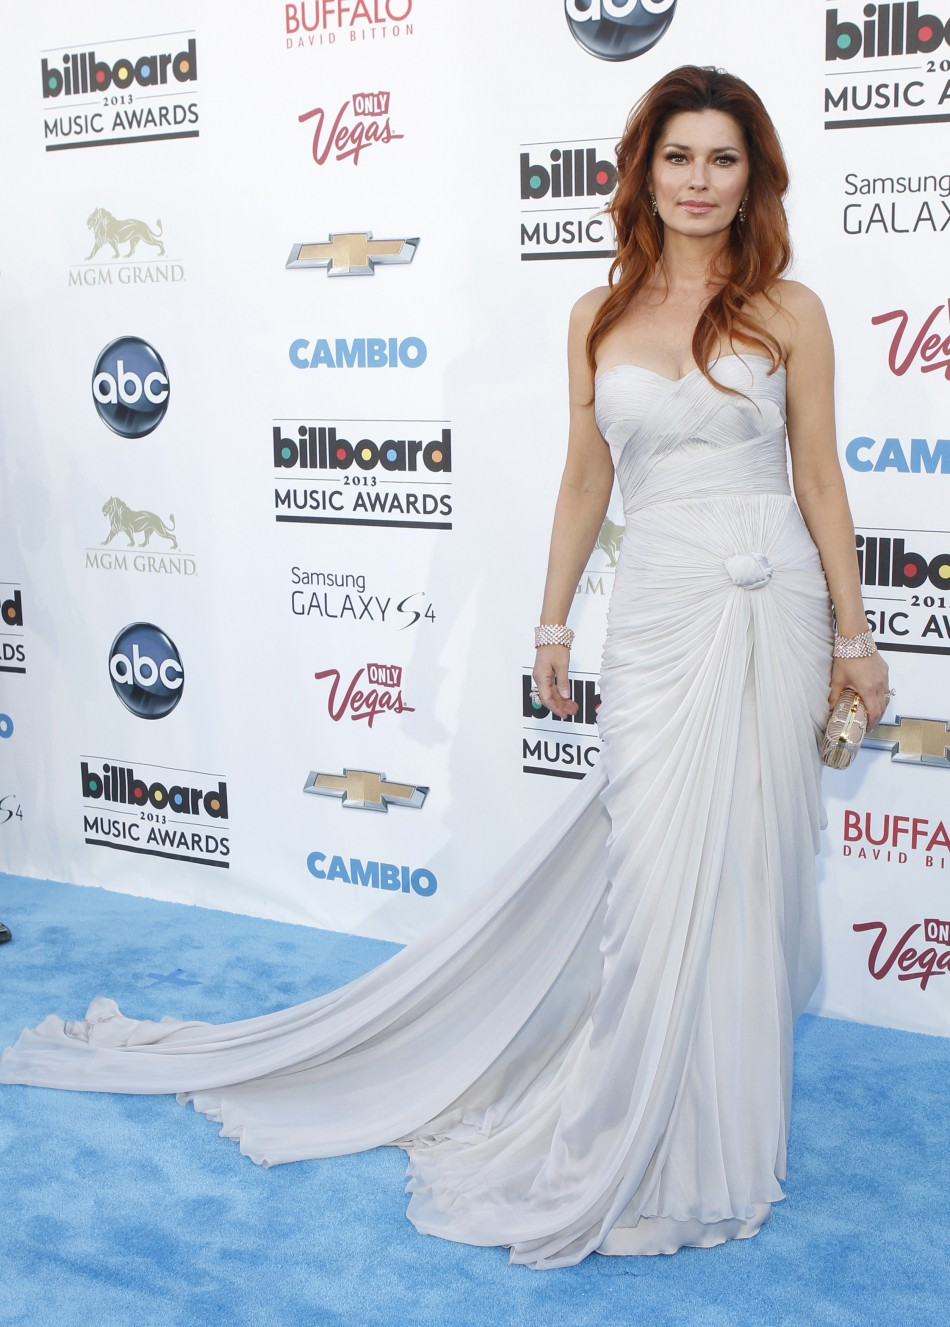 Canadian country singer Shania Twain arrives at the Billboard Music Awards in Las Vegas, Nevada May 19, 2013.